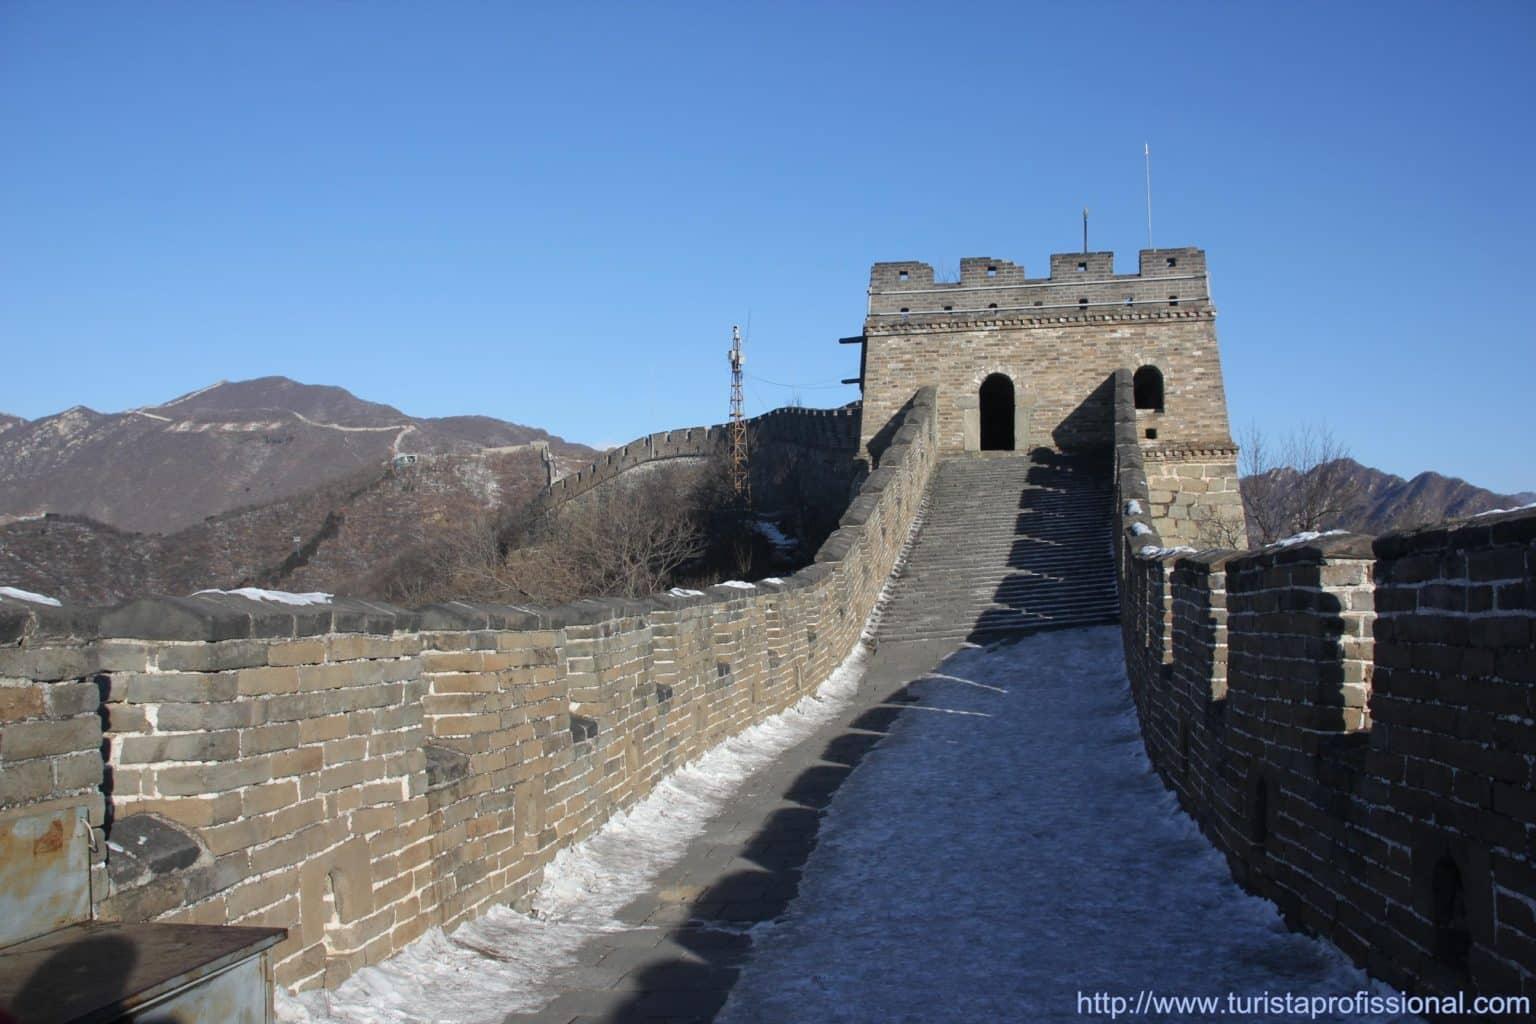 Muralha da China 2 - Olhares | Muralha da China